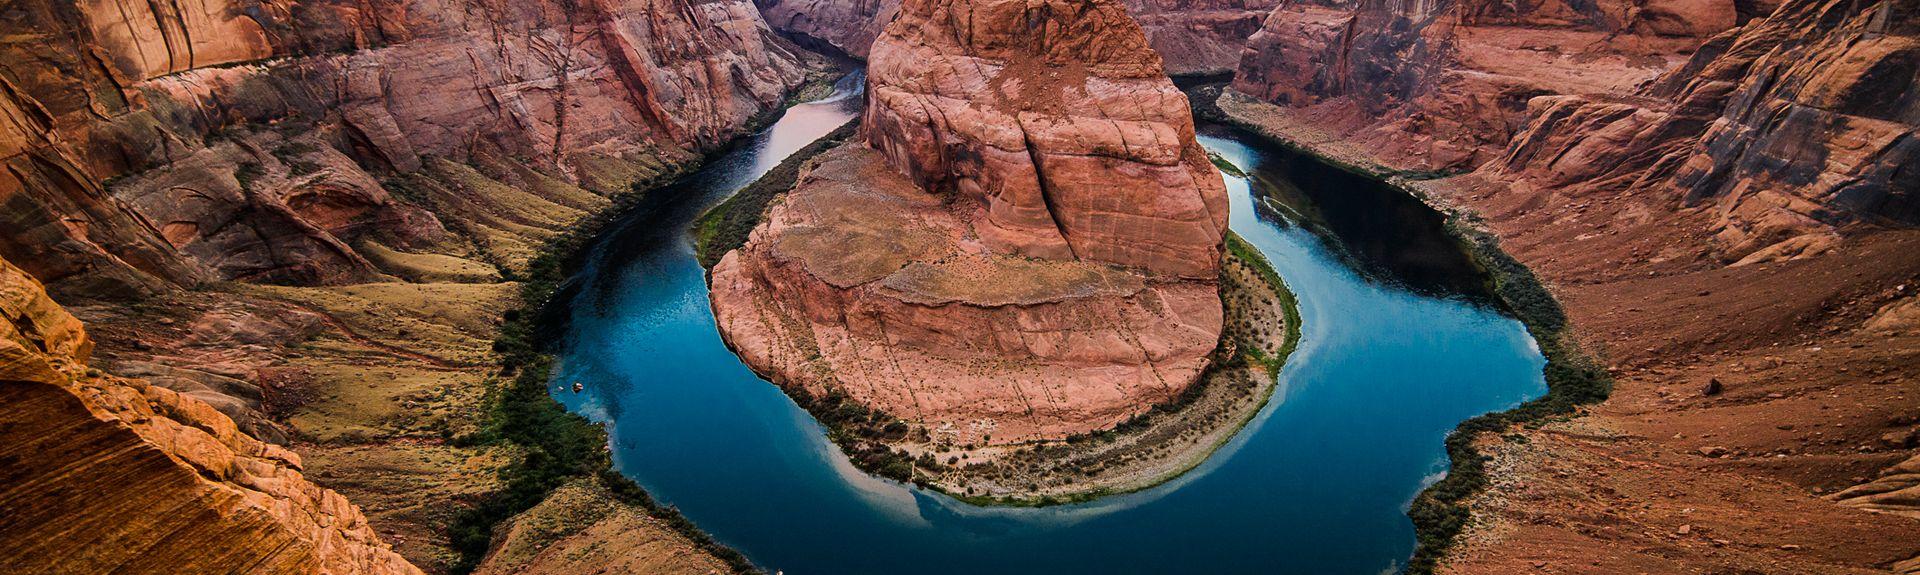 Mesa, Arizona, Estados Unidos